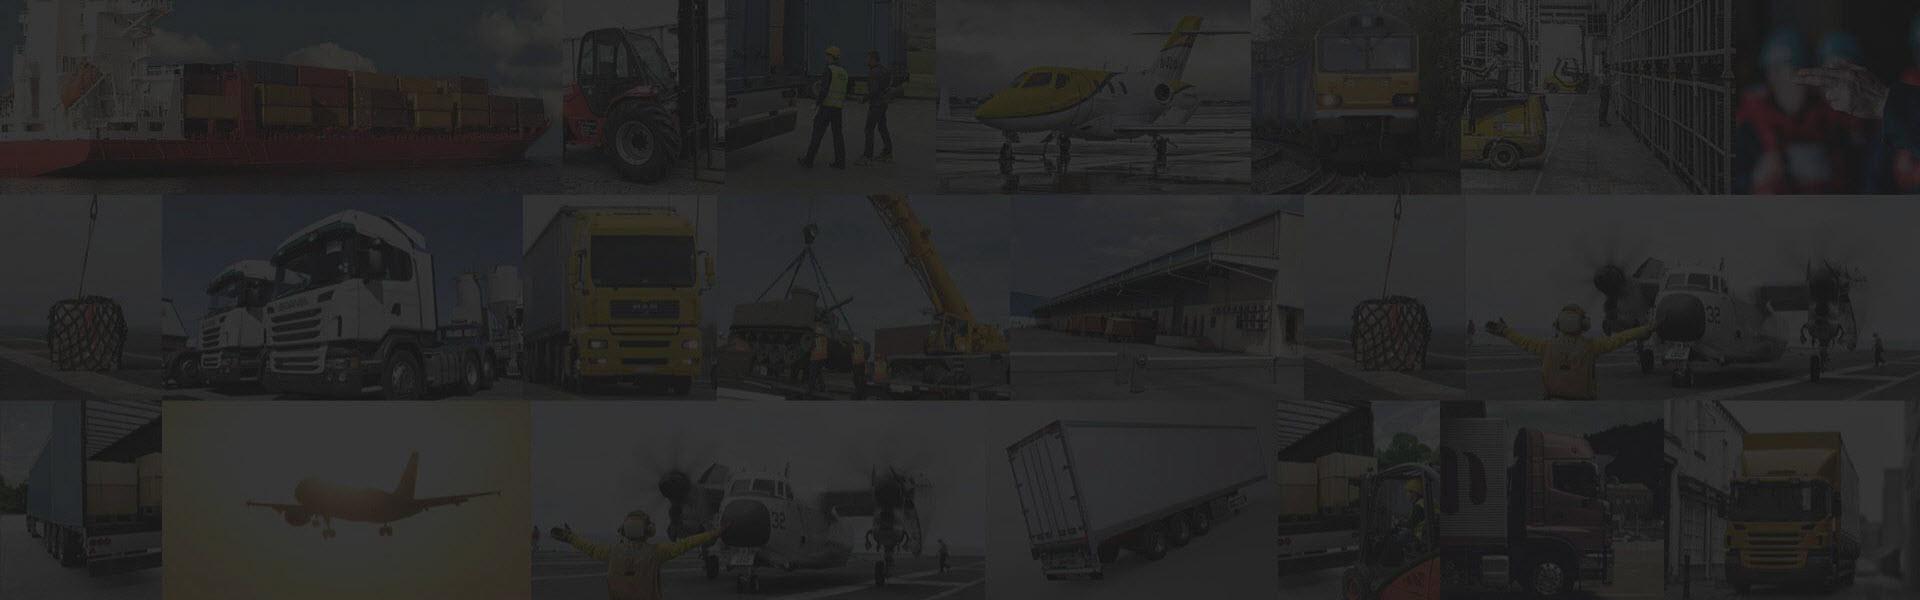 Freight & Cargo Global Logistics